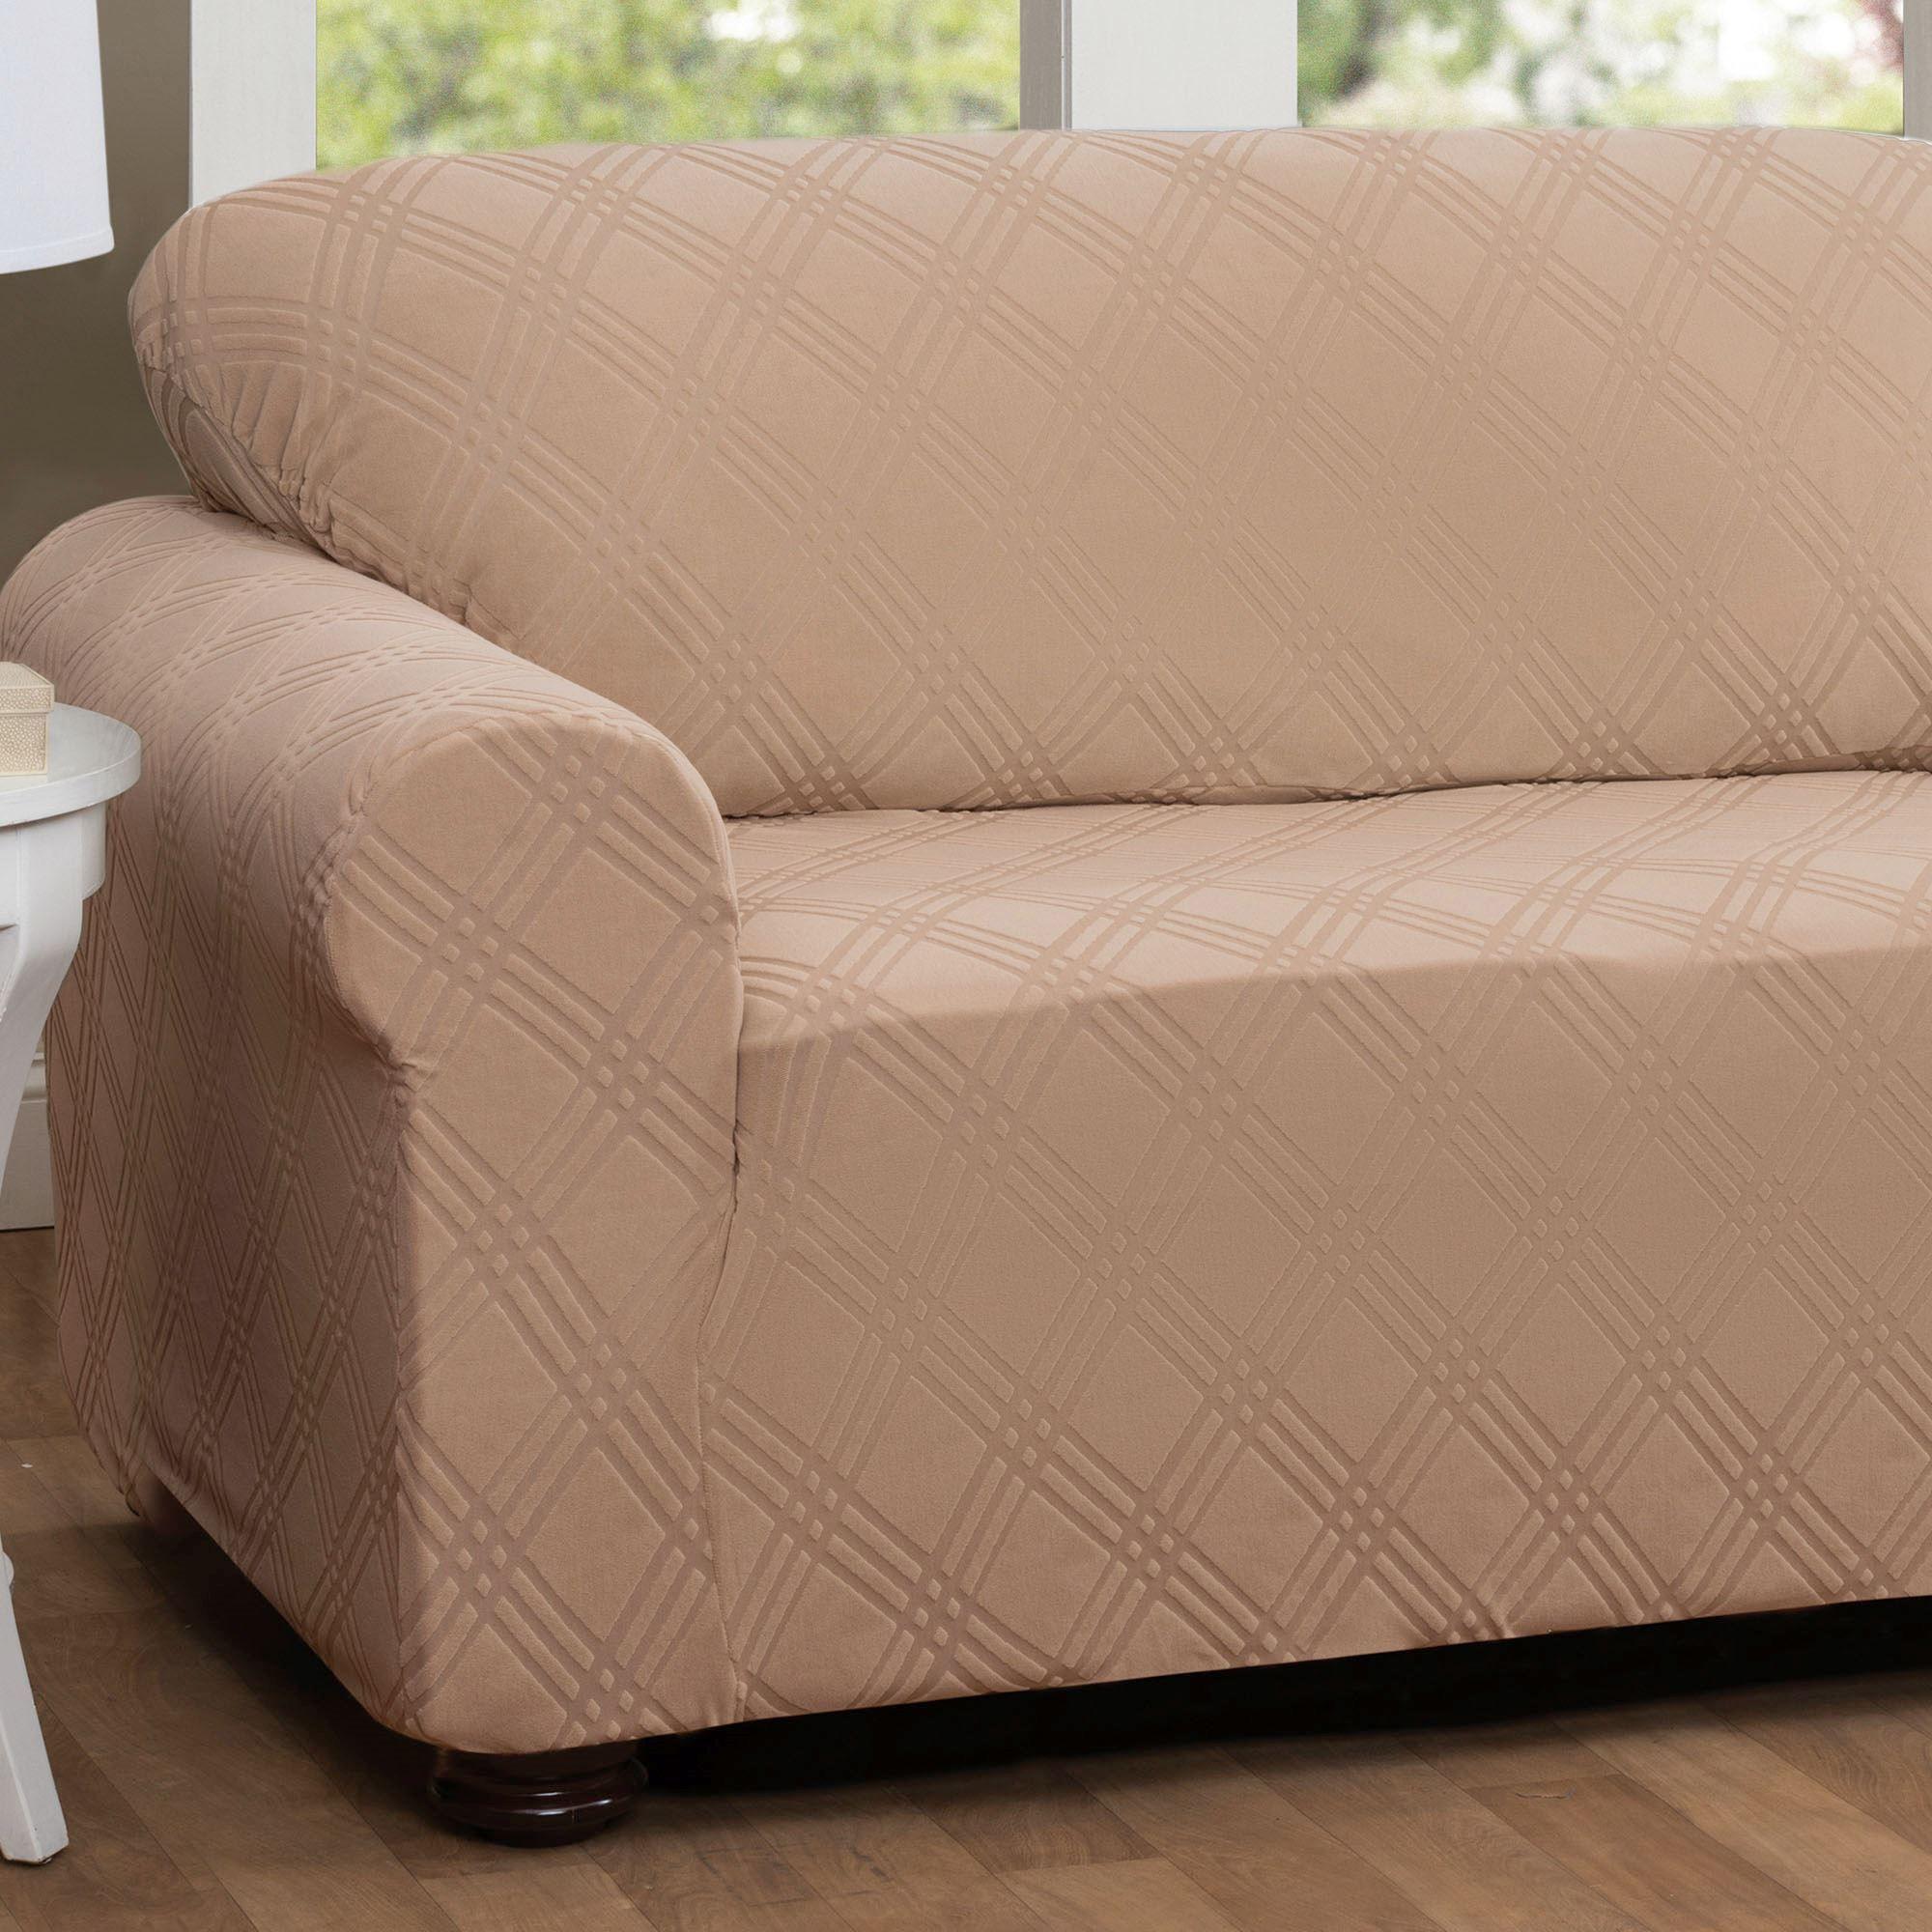 Double Diamond Stretch Slipcover Sofa